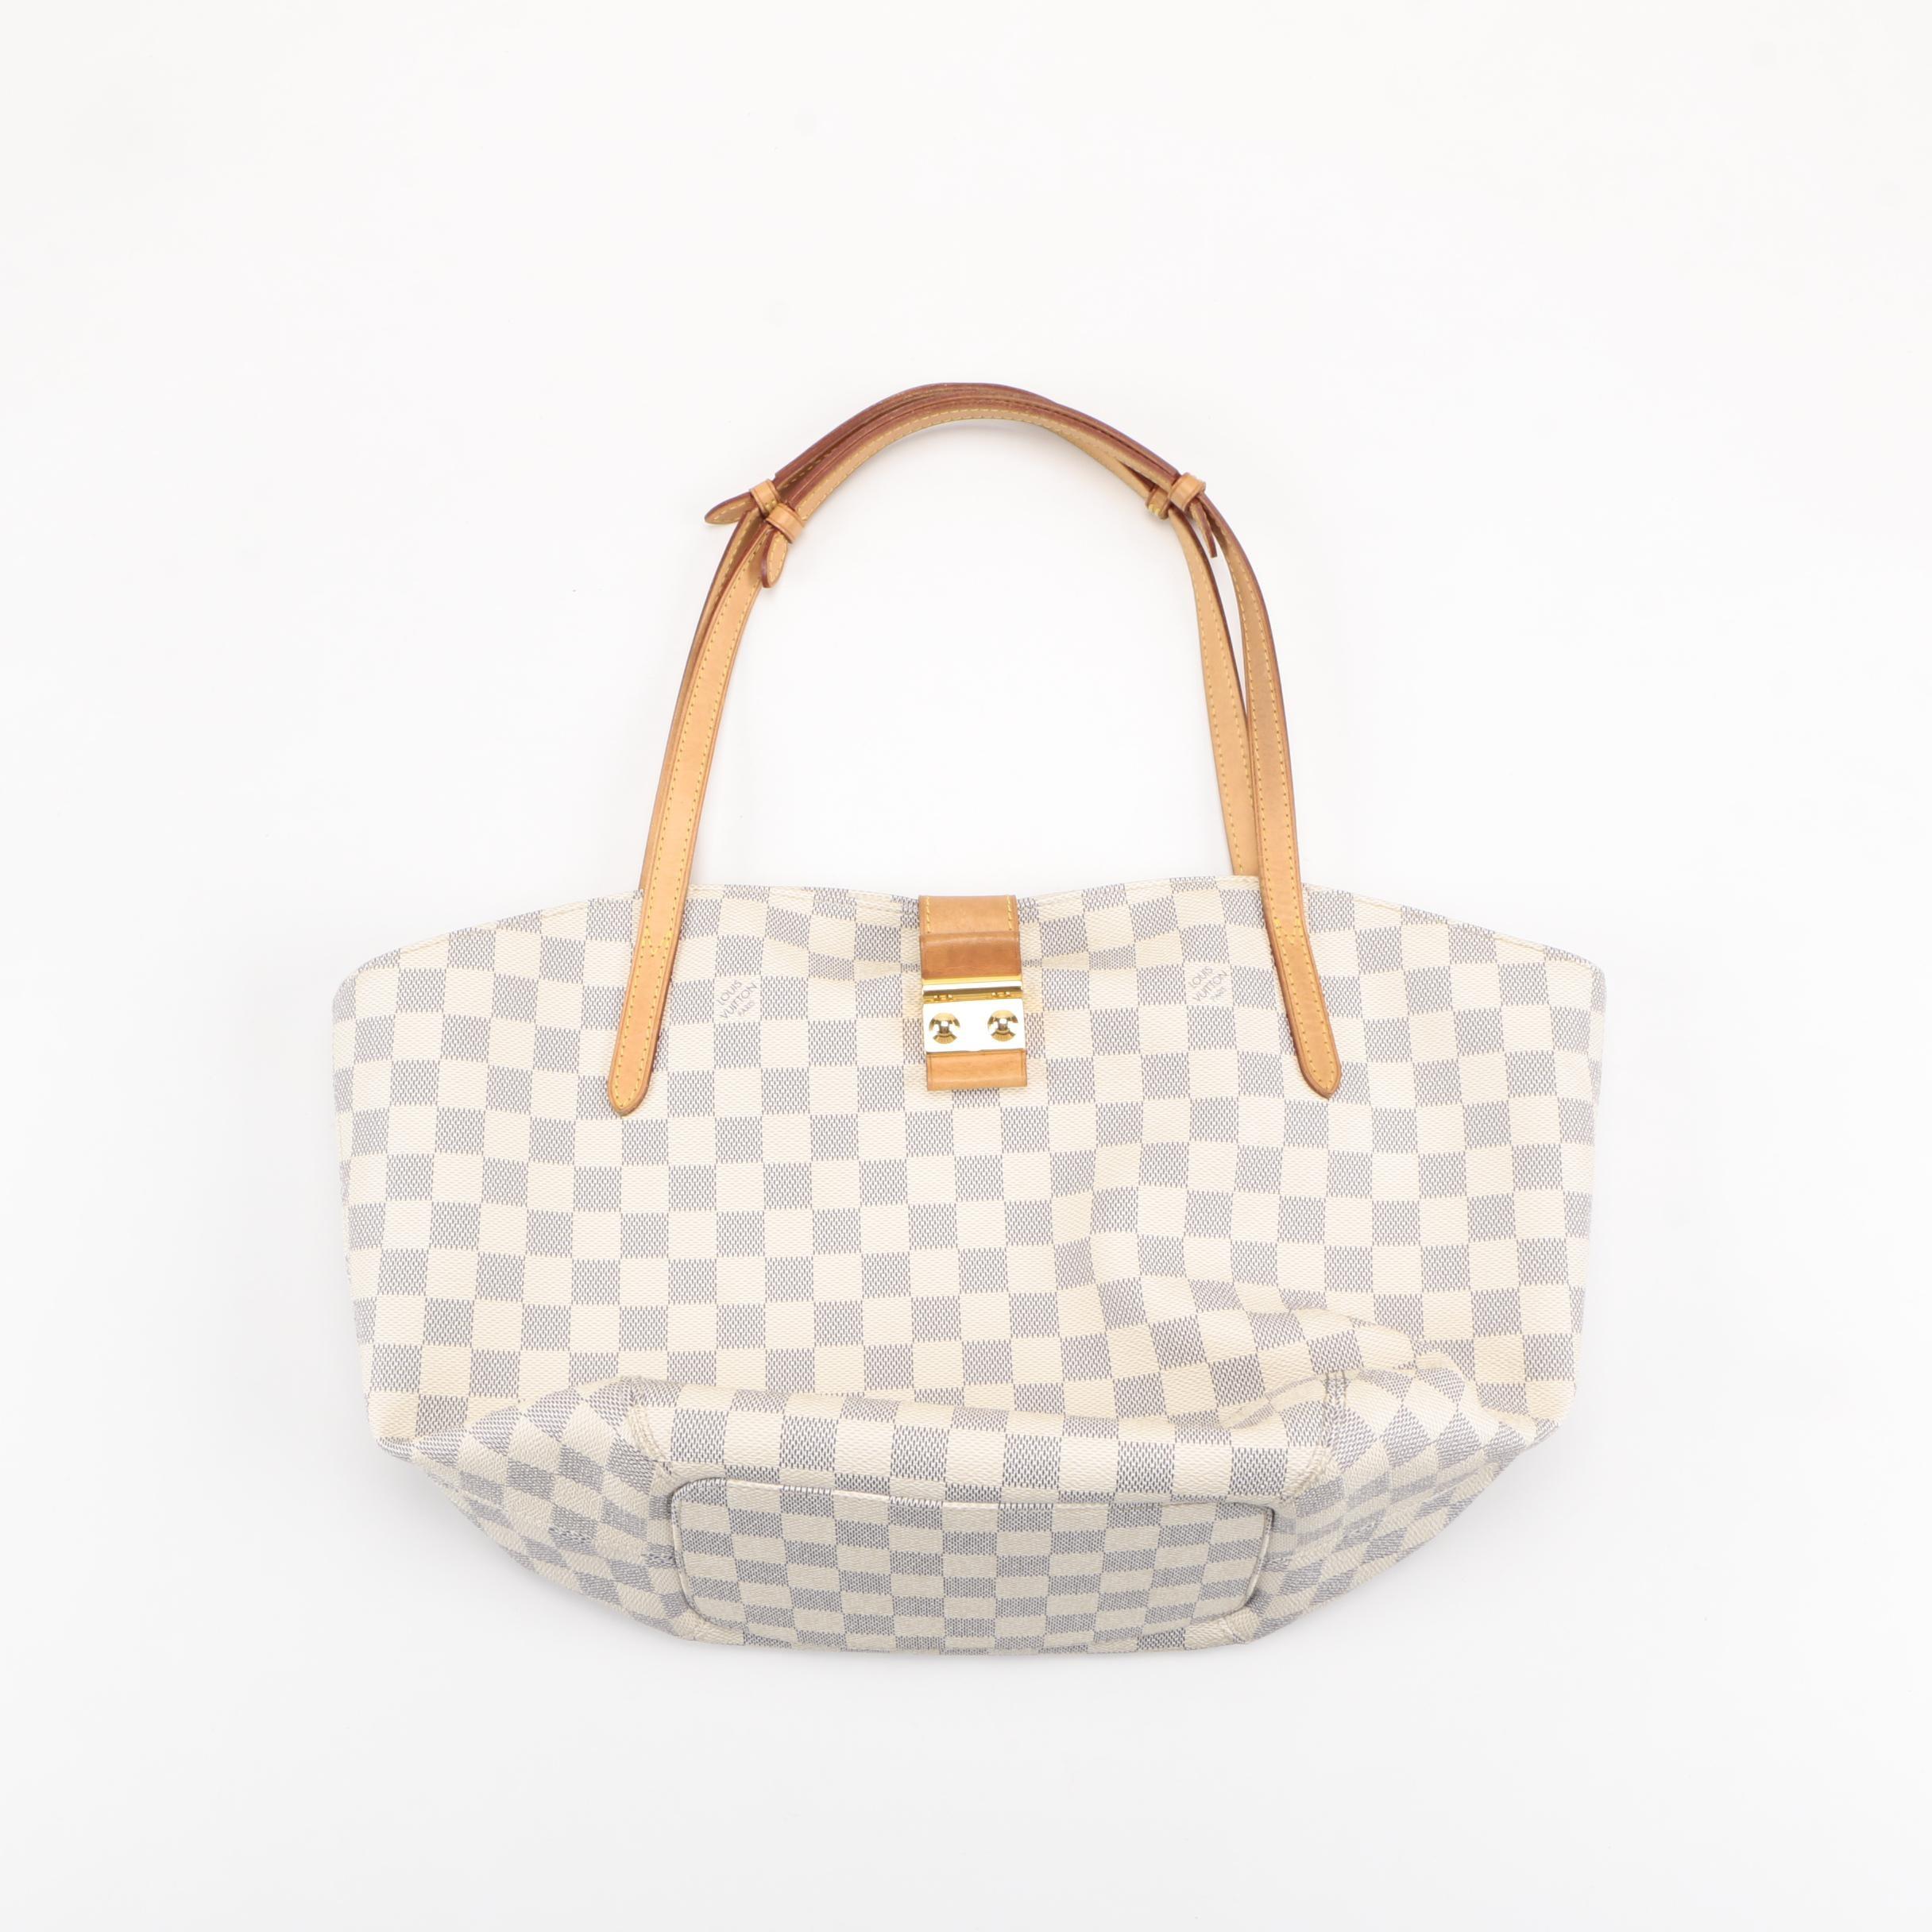 Louis Vuitton Damier Azur Salina Handbag